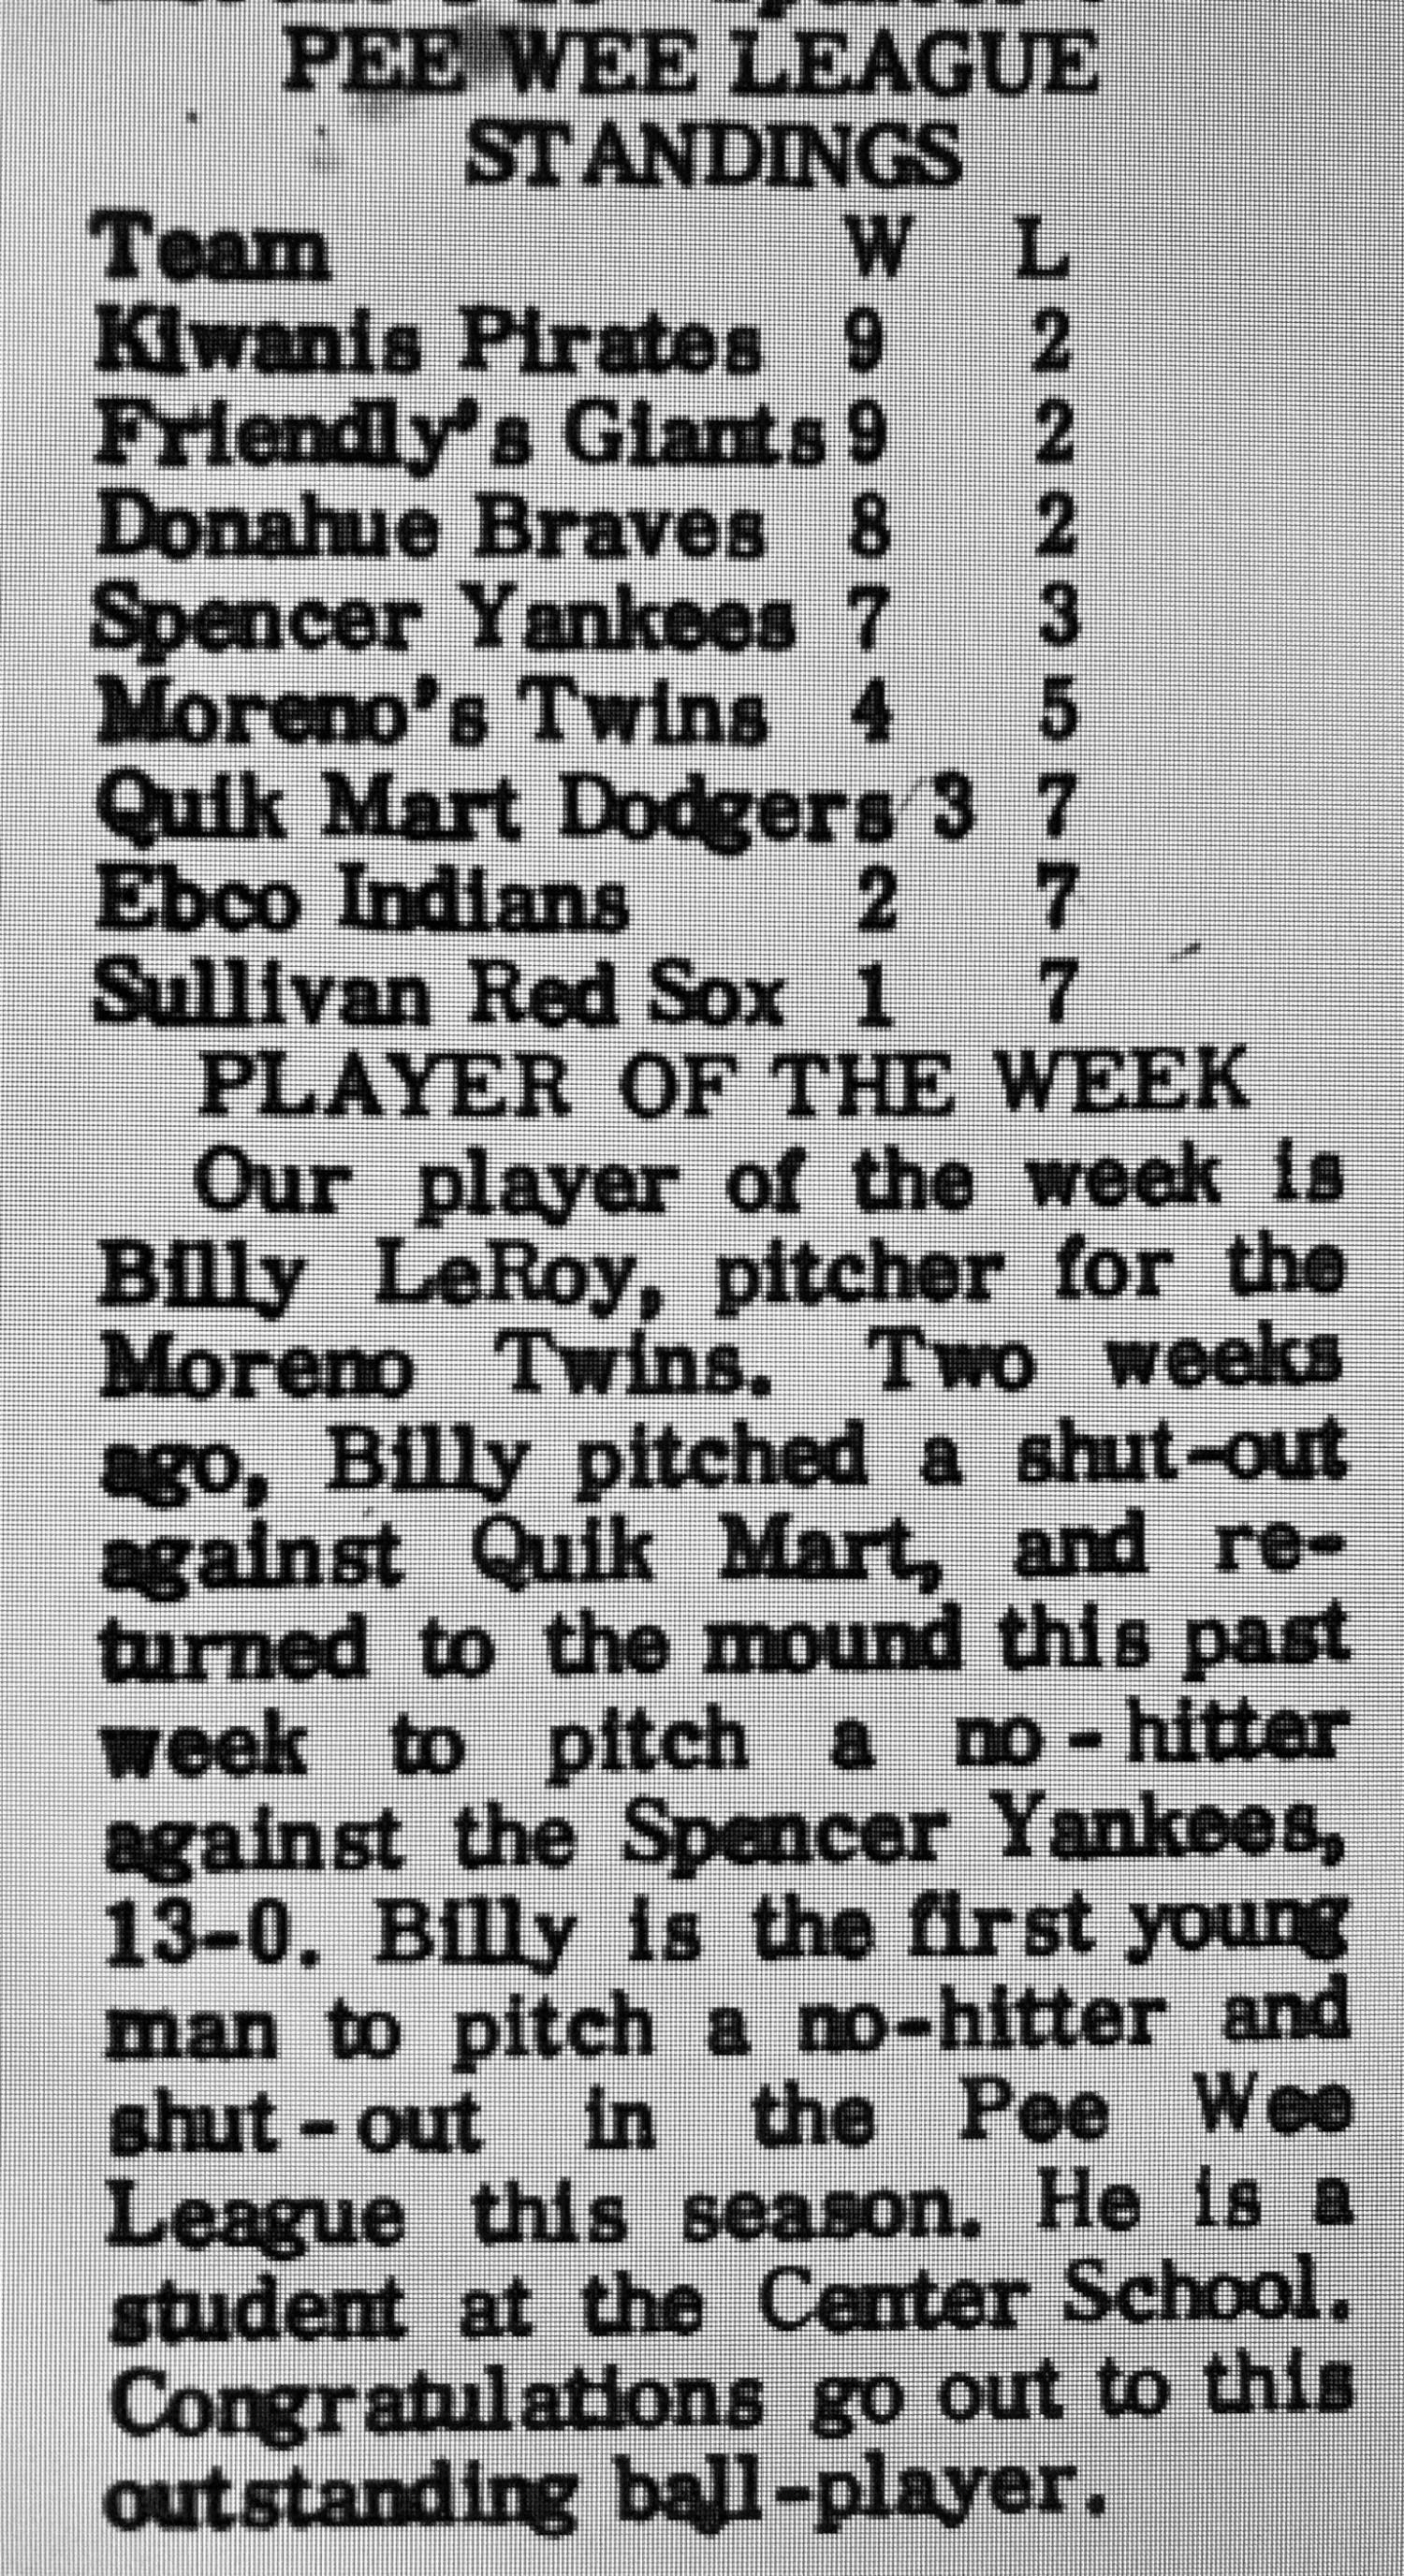 Sept. 1969 Pee Wee standings, Burlington MA